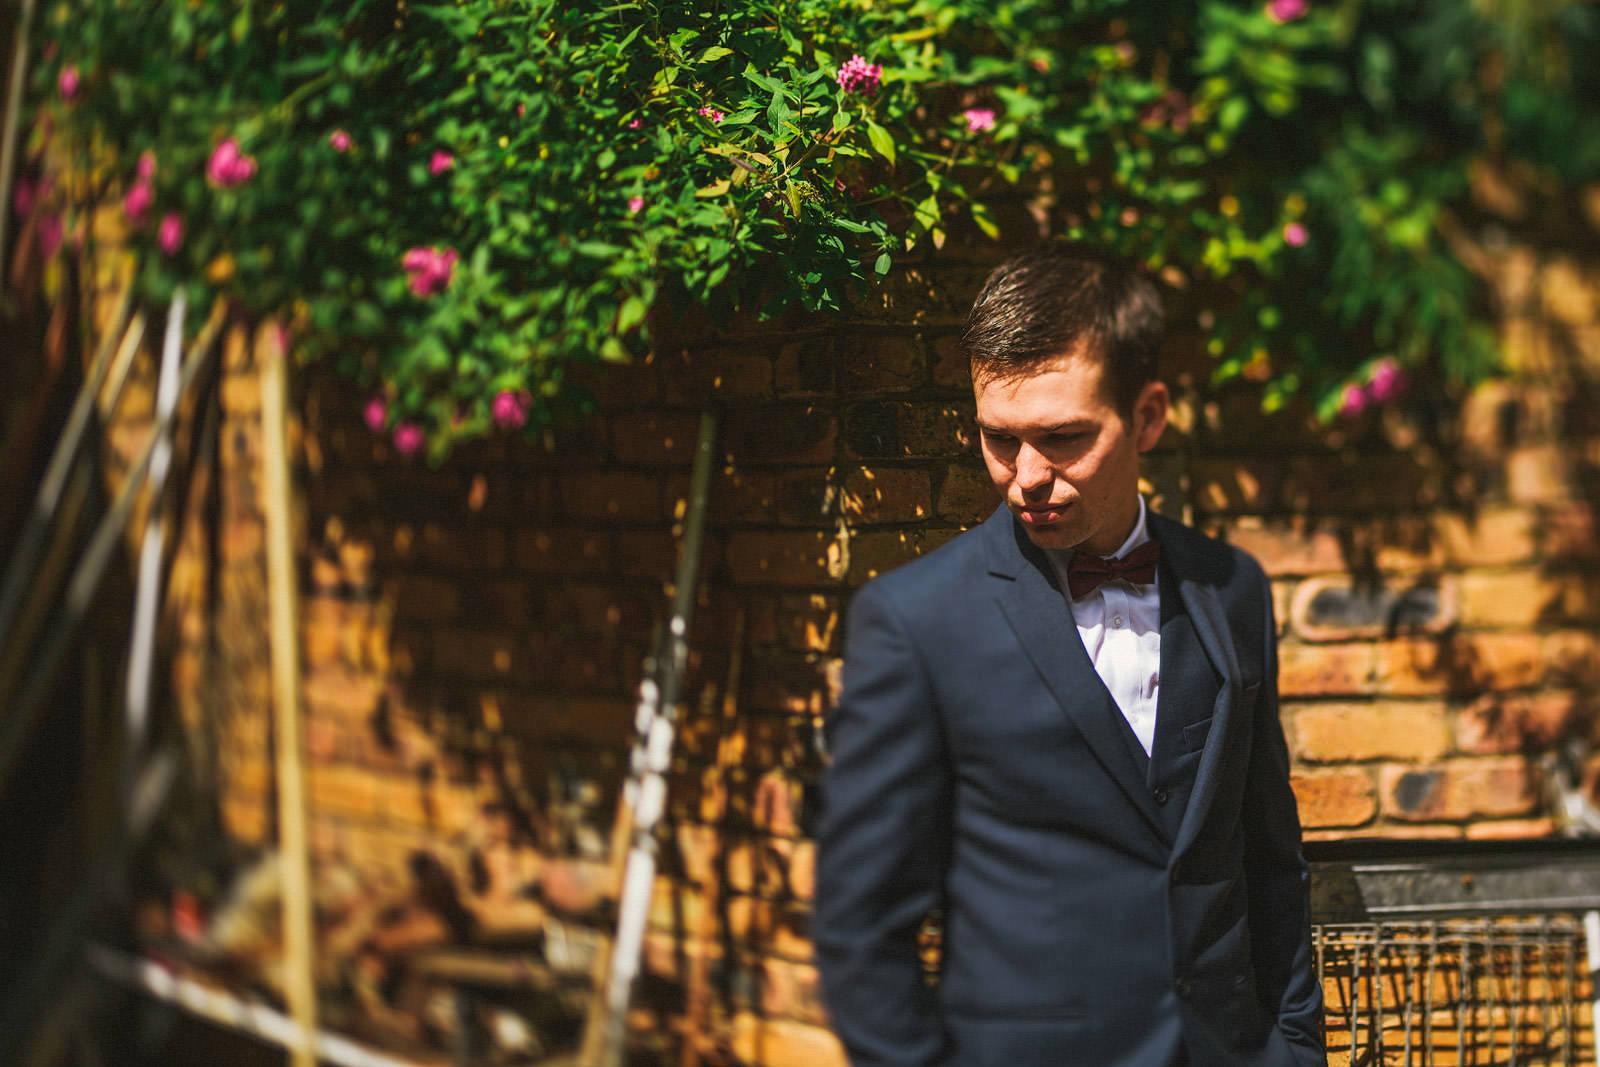 tablelands_wedding_0004